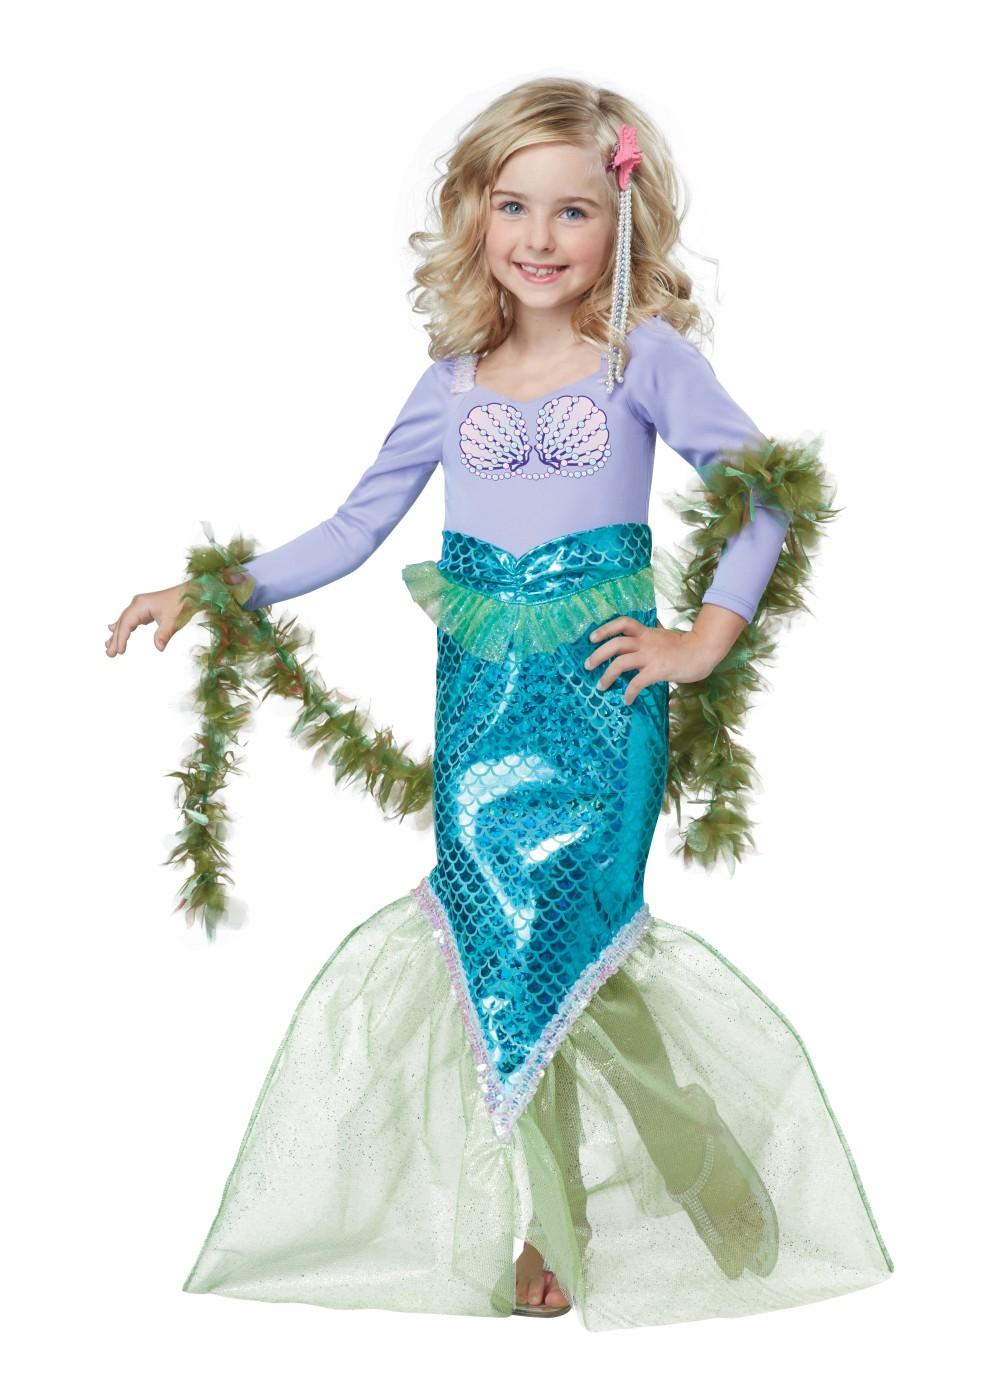 Ariel Costumes - Disney Ariel Dress, Wigs, Shoes & Wands